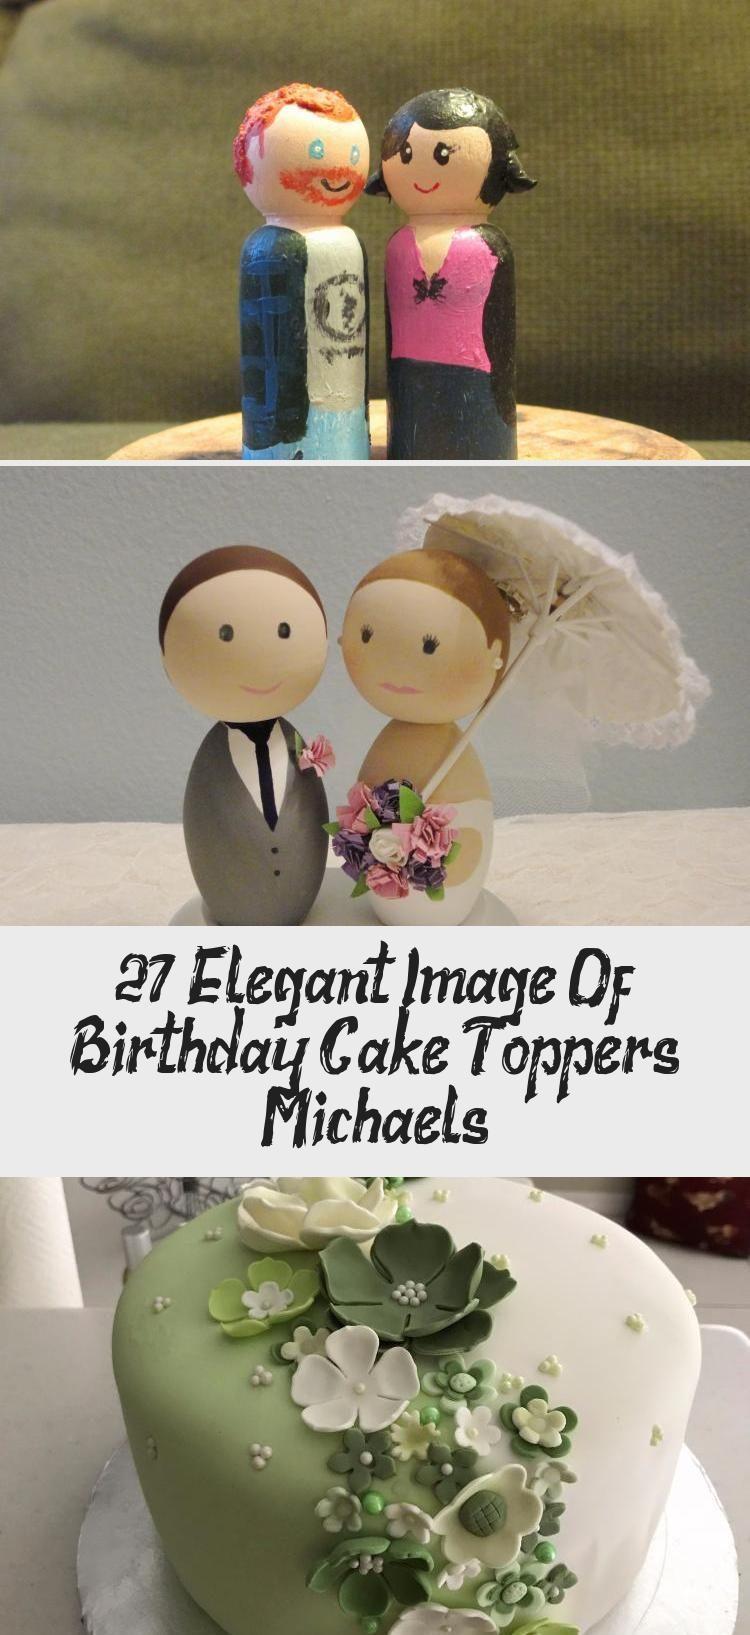 27 Elegant Image Of Birthday Cake Toppers Michaels Decoration Birthday Cake Toppe In 2020 Birthday Cake Toppers Birthday Cake Decorating Happy Birthday Cake Topper